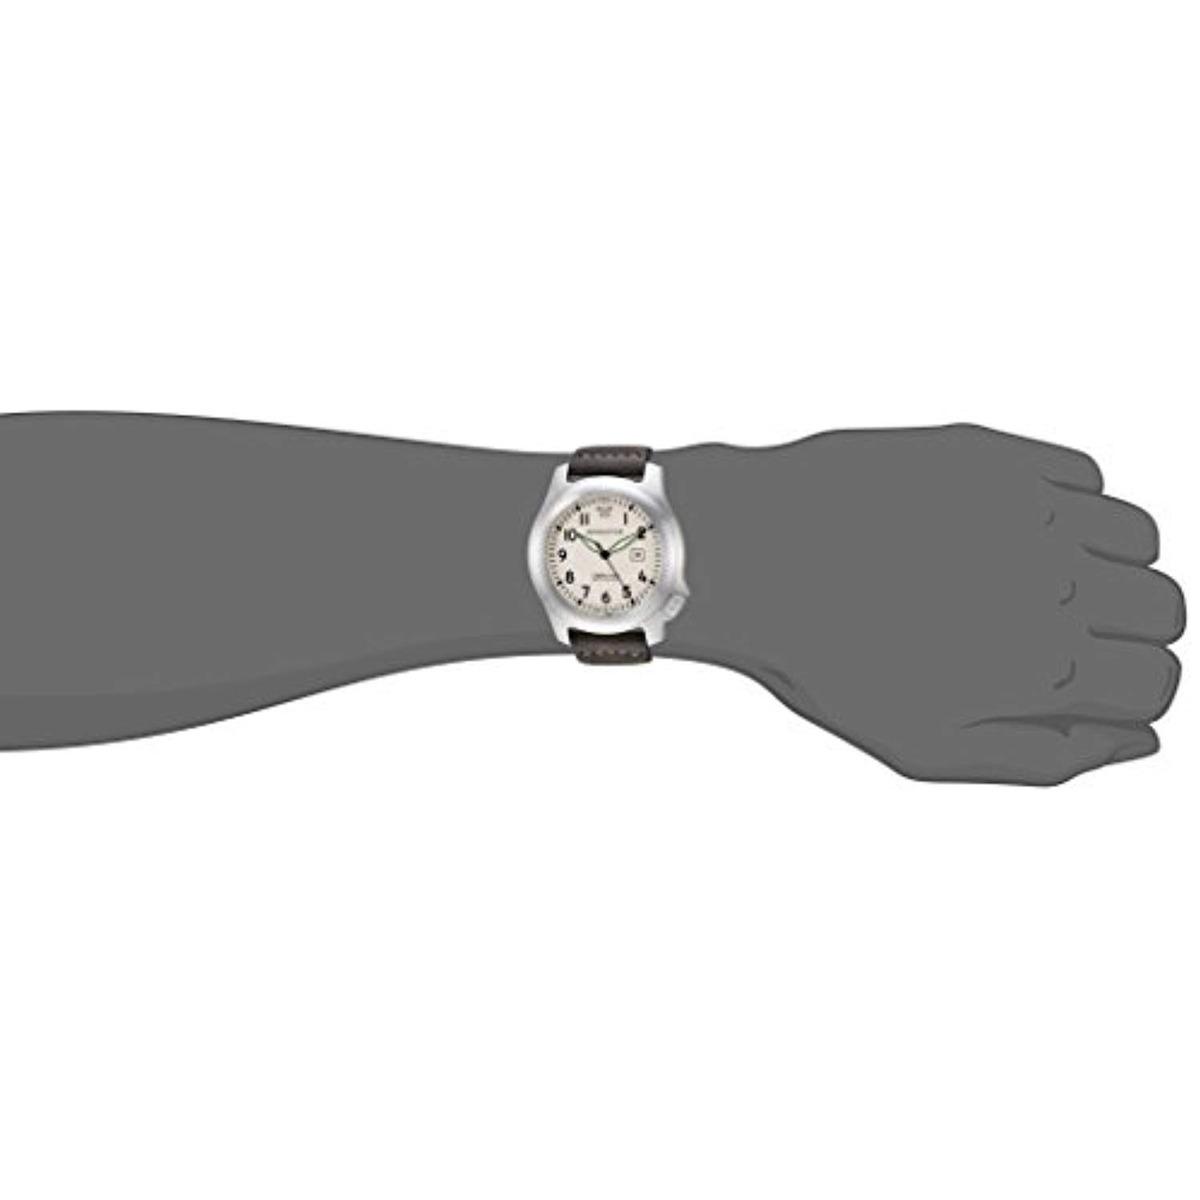 Steelix Reloj S Hombre Men Sapphire Momentum 8wPkOn0